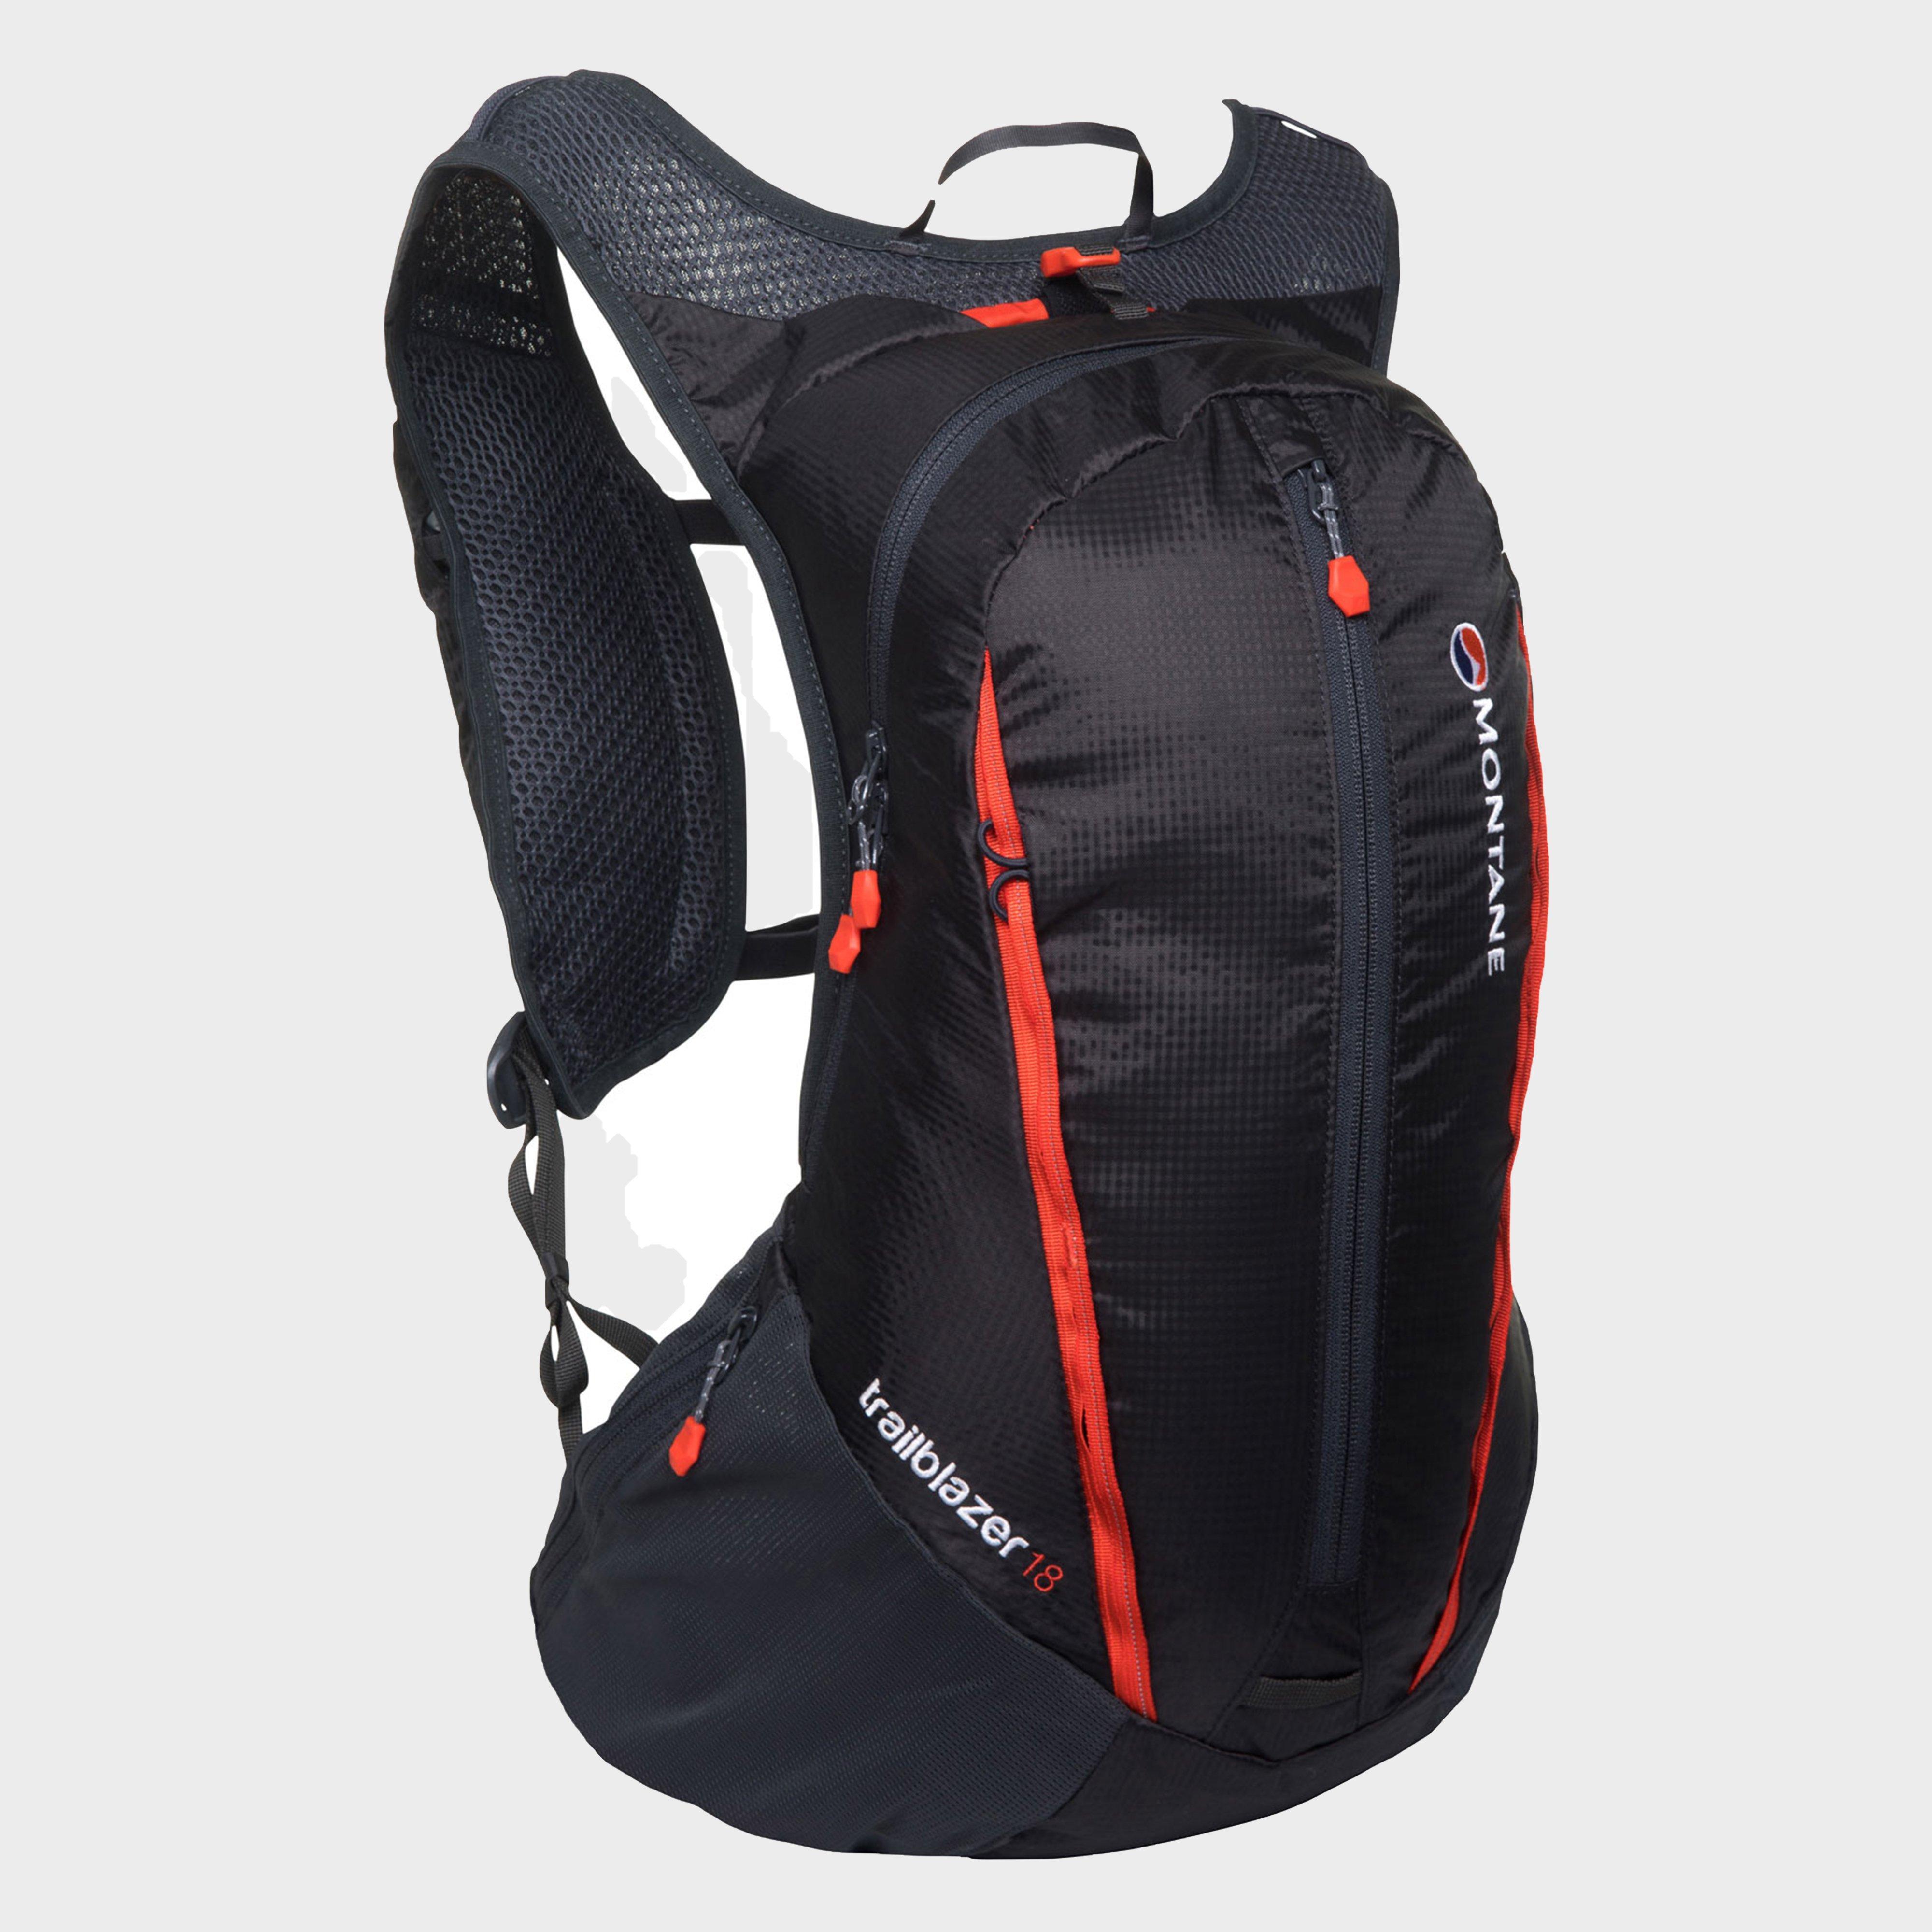 Montane Trailblazer 18 Daypack